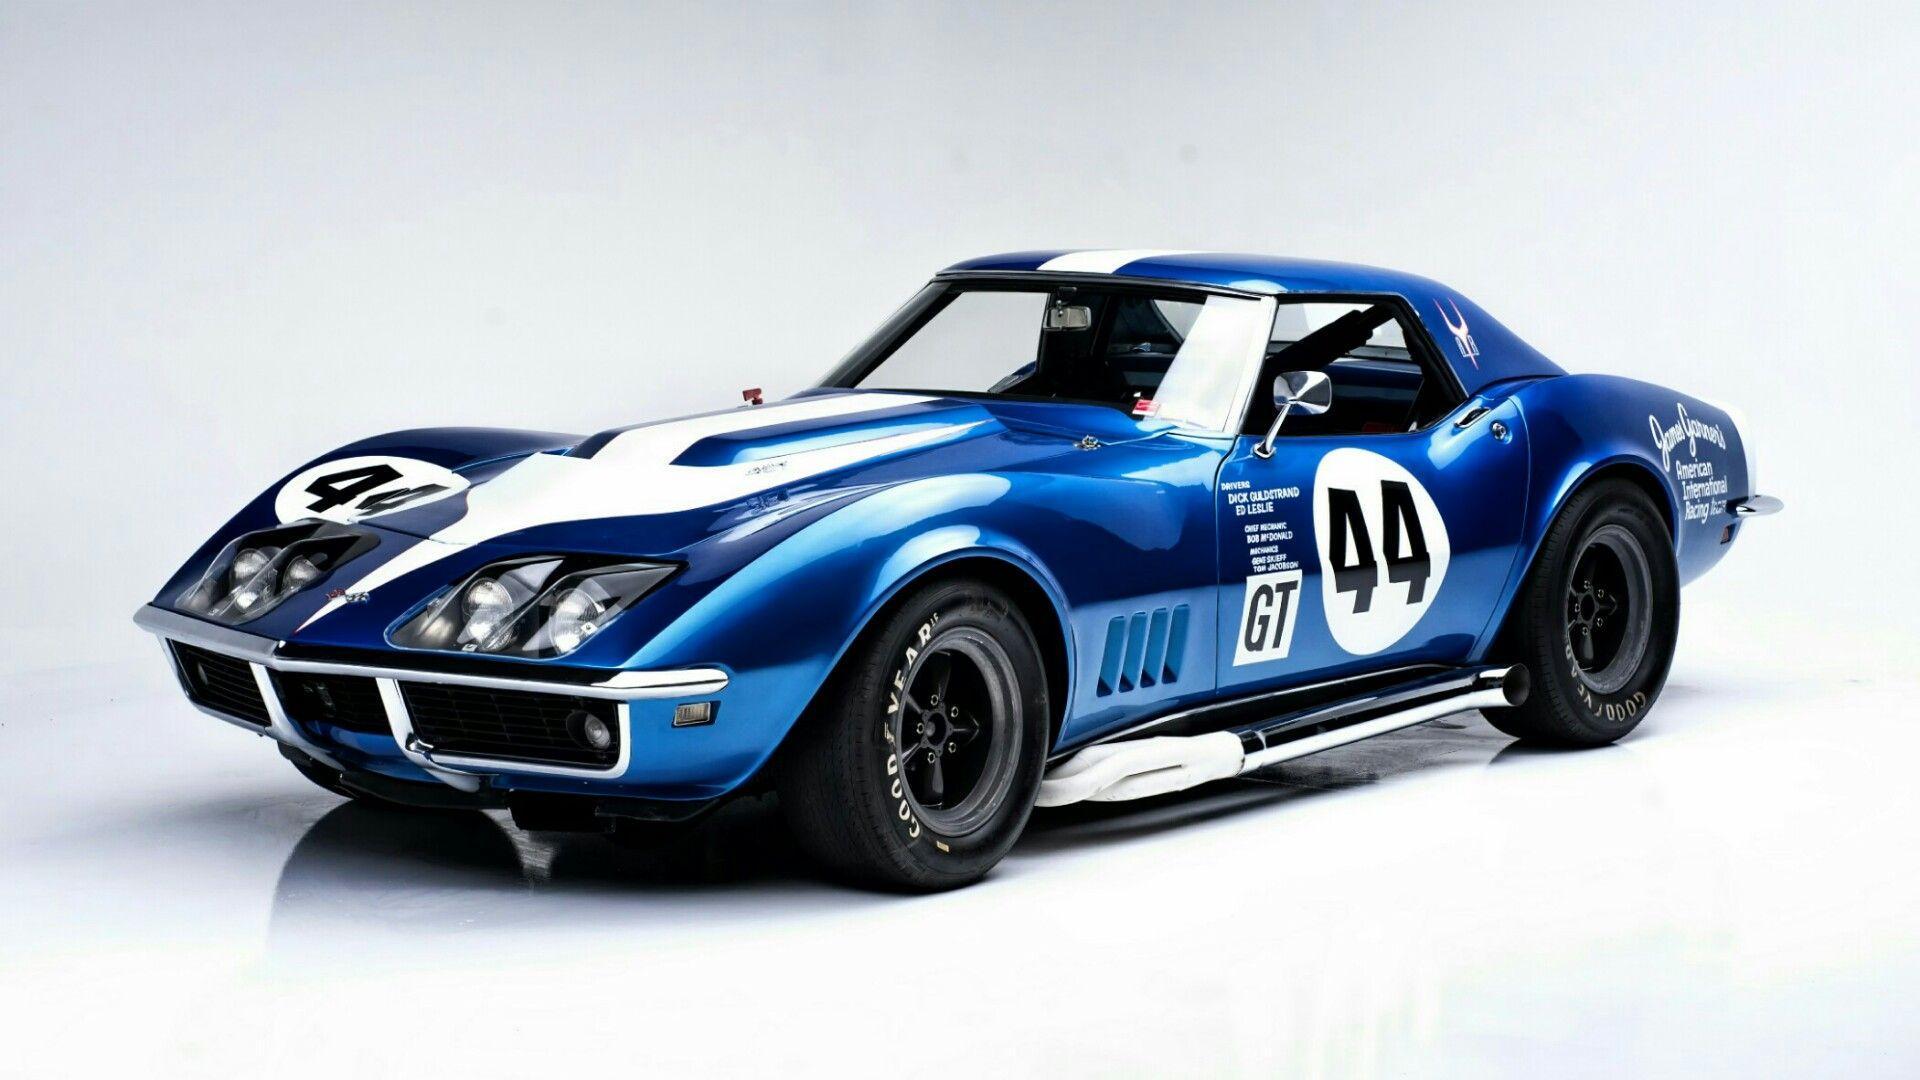 74 Best Free Blue Sports Car Wallpapers WallpaperAccess